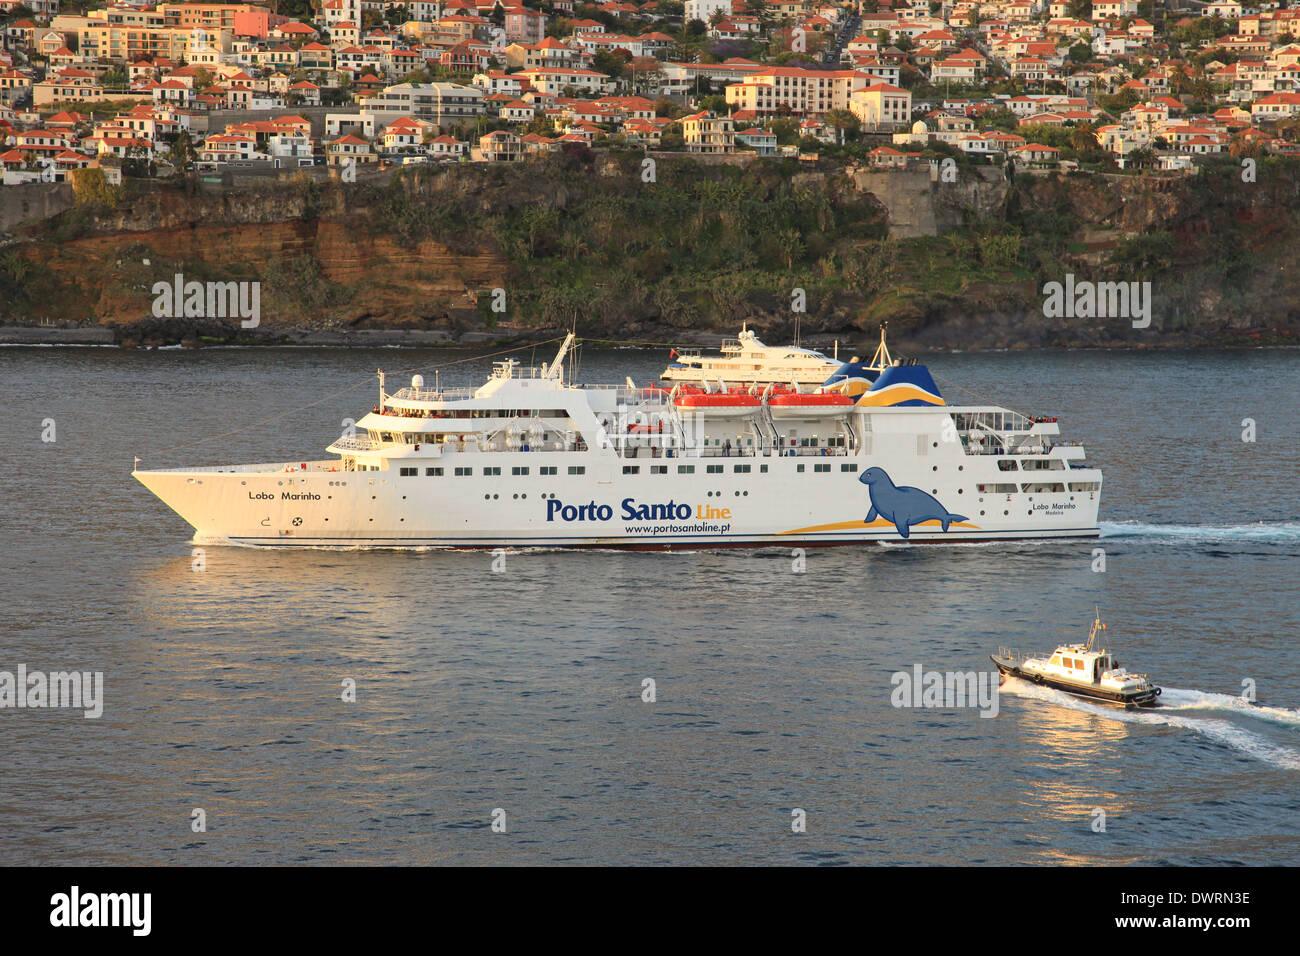 Porto Santo Line ferry mv Lobo Marinho entering Funchal harbor Madeira - Stock Image